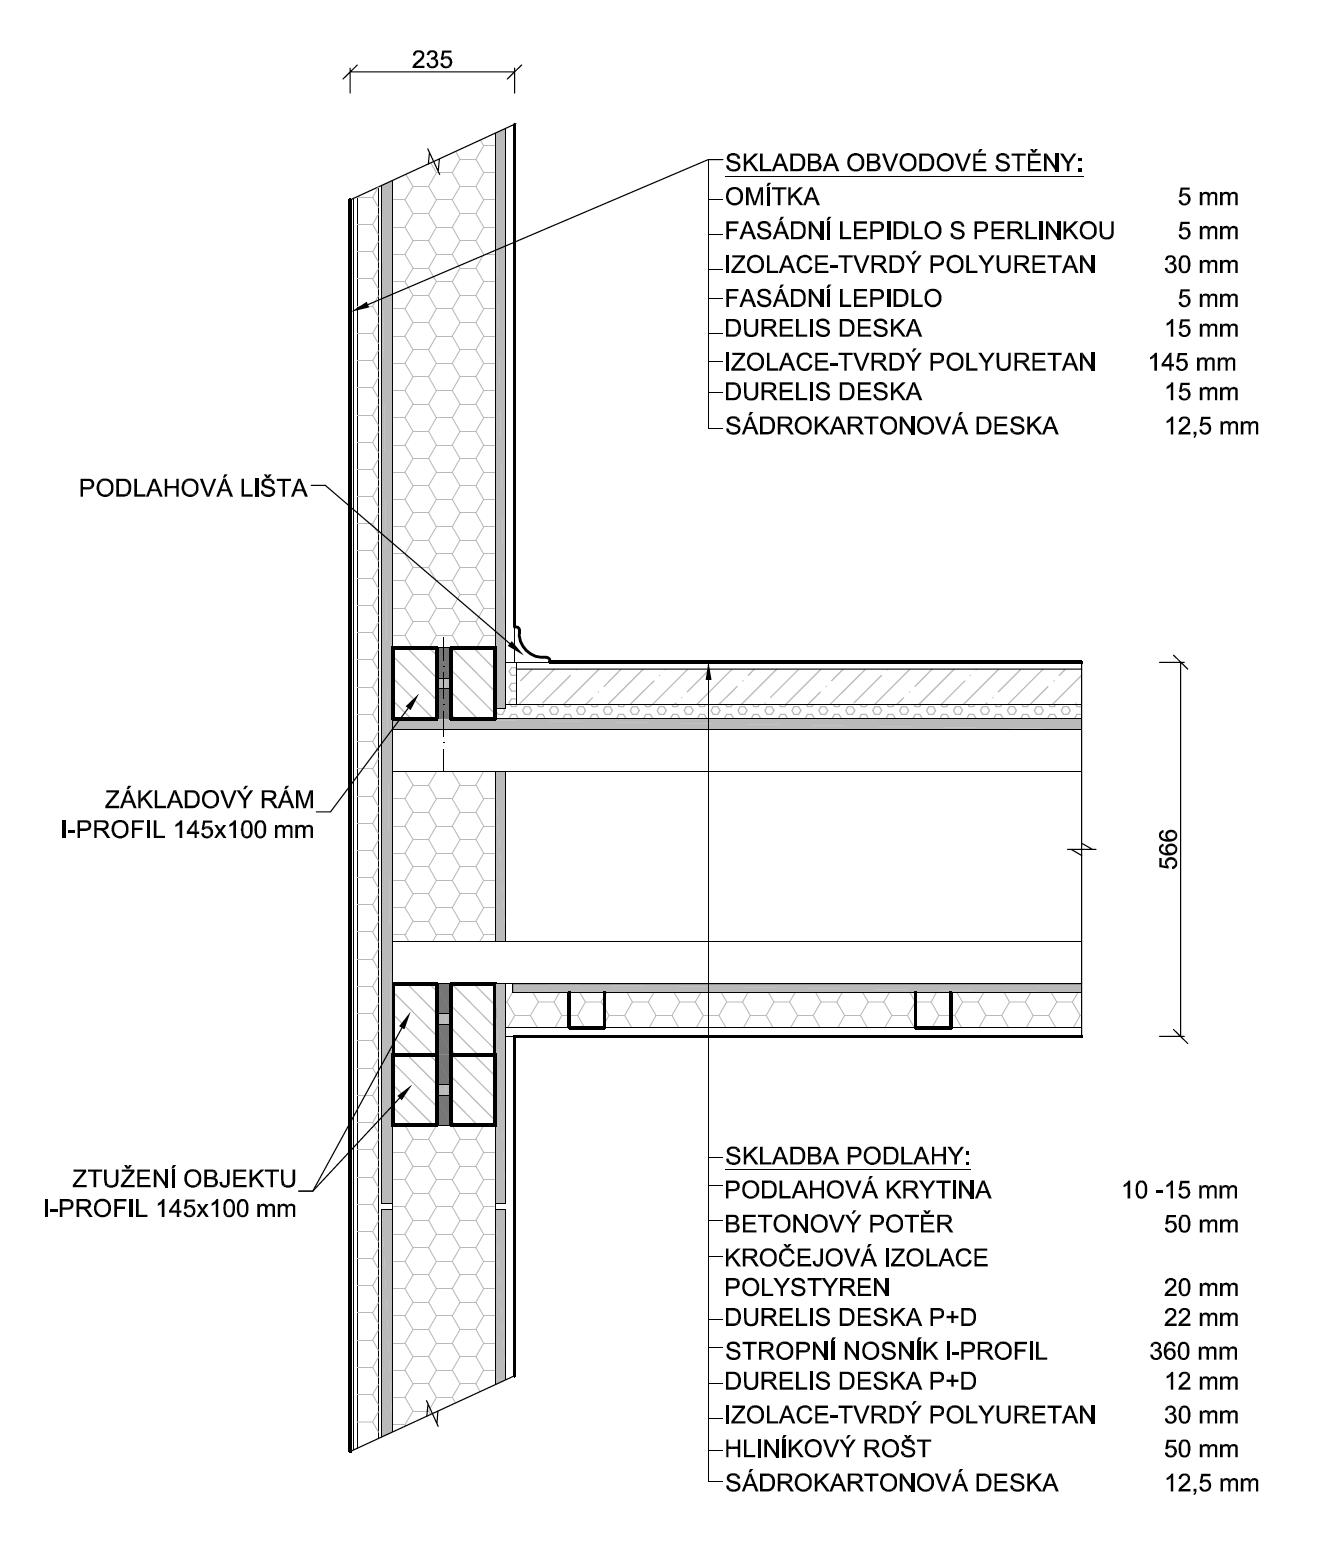 Nosné prvky stropu - nákres | Homing.cz